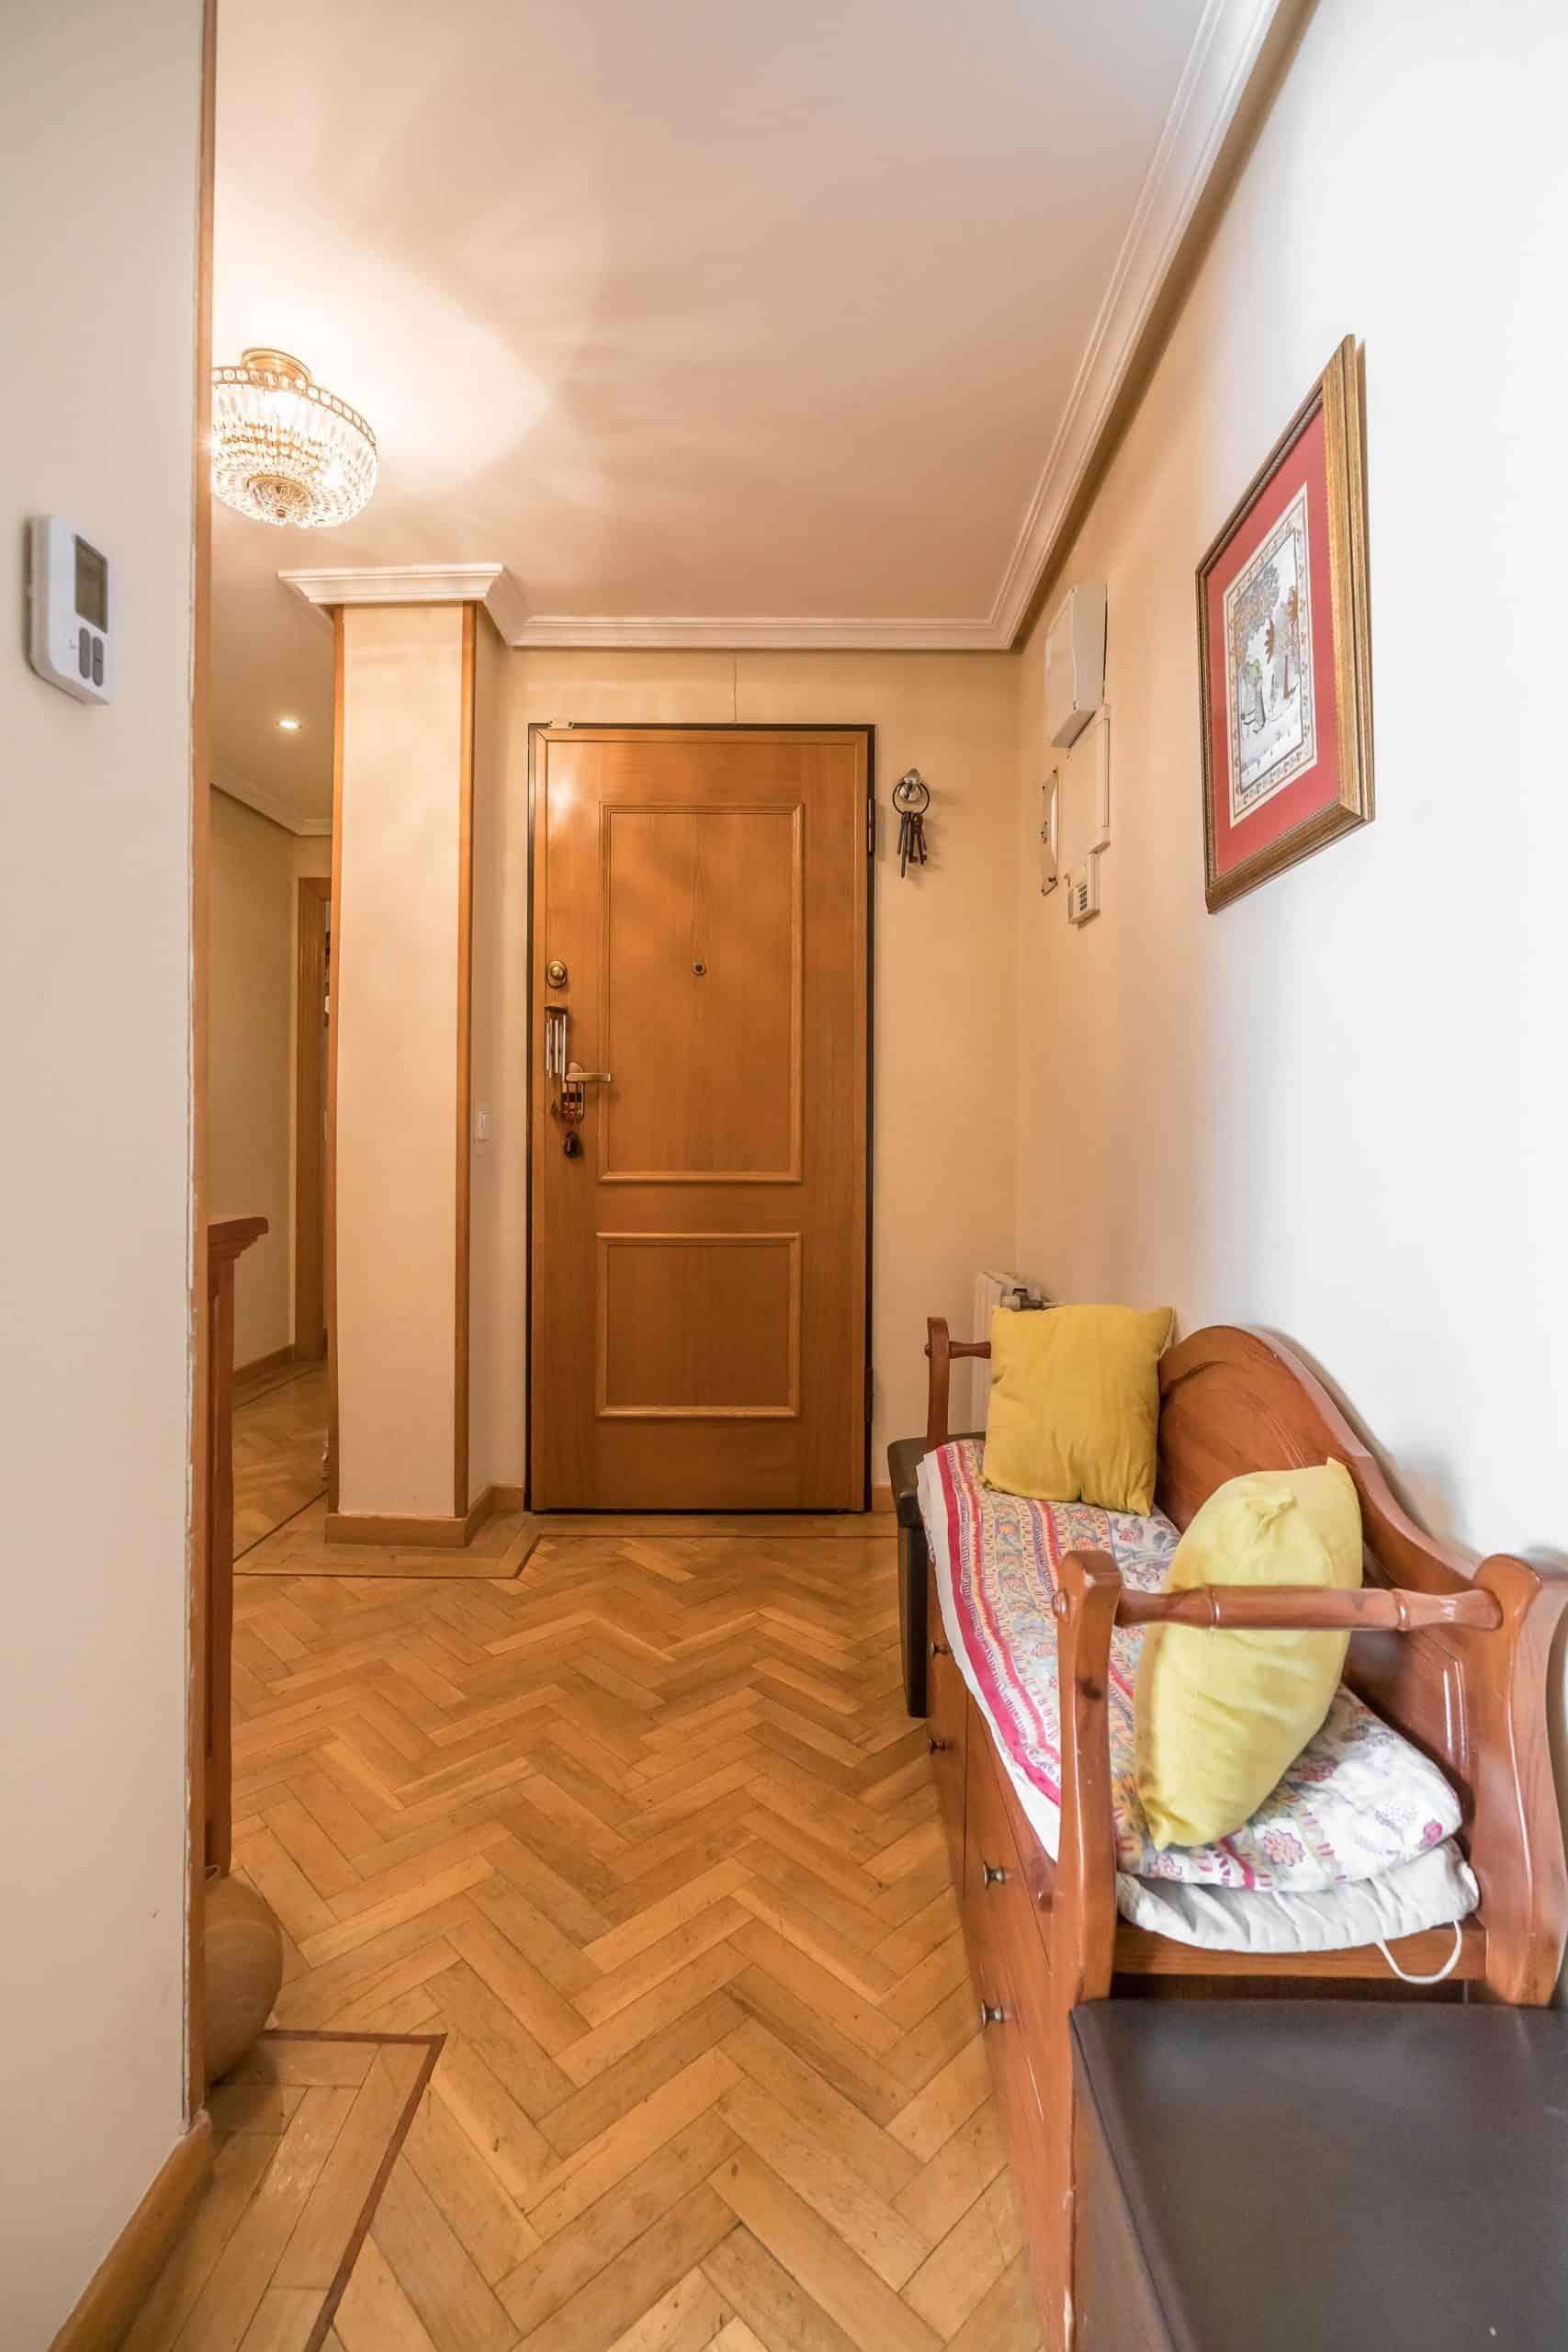 Agencia Inmobiliaria de Madrid-FUTUROCASA-Zona ARGANZUELA-EMBAJADORES-LEGAZPI1 ENTRADA PASILLO(2)